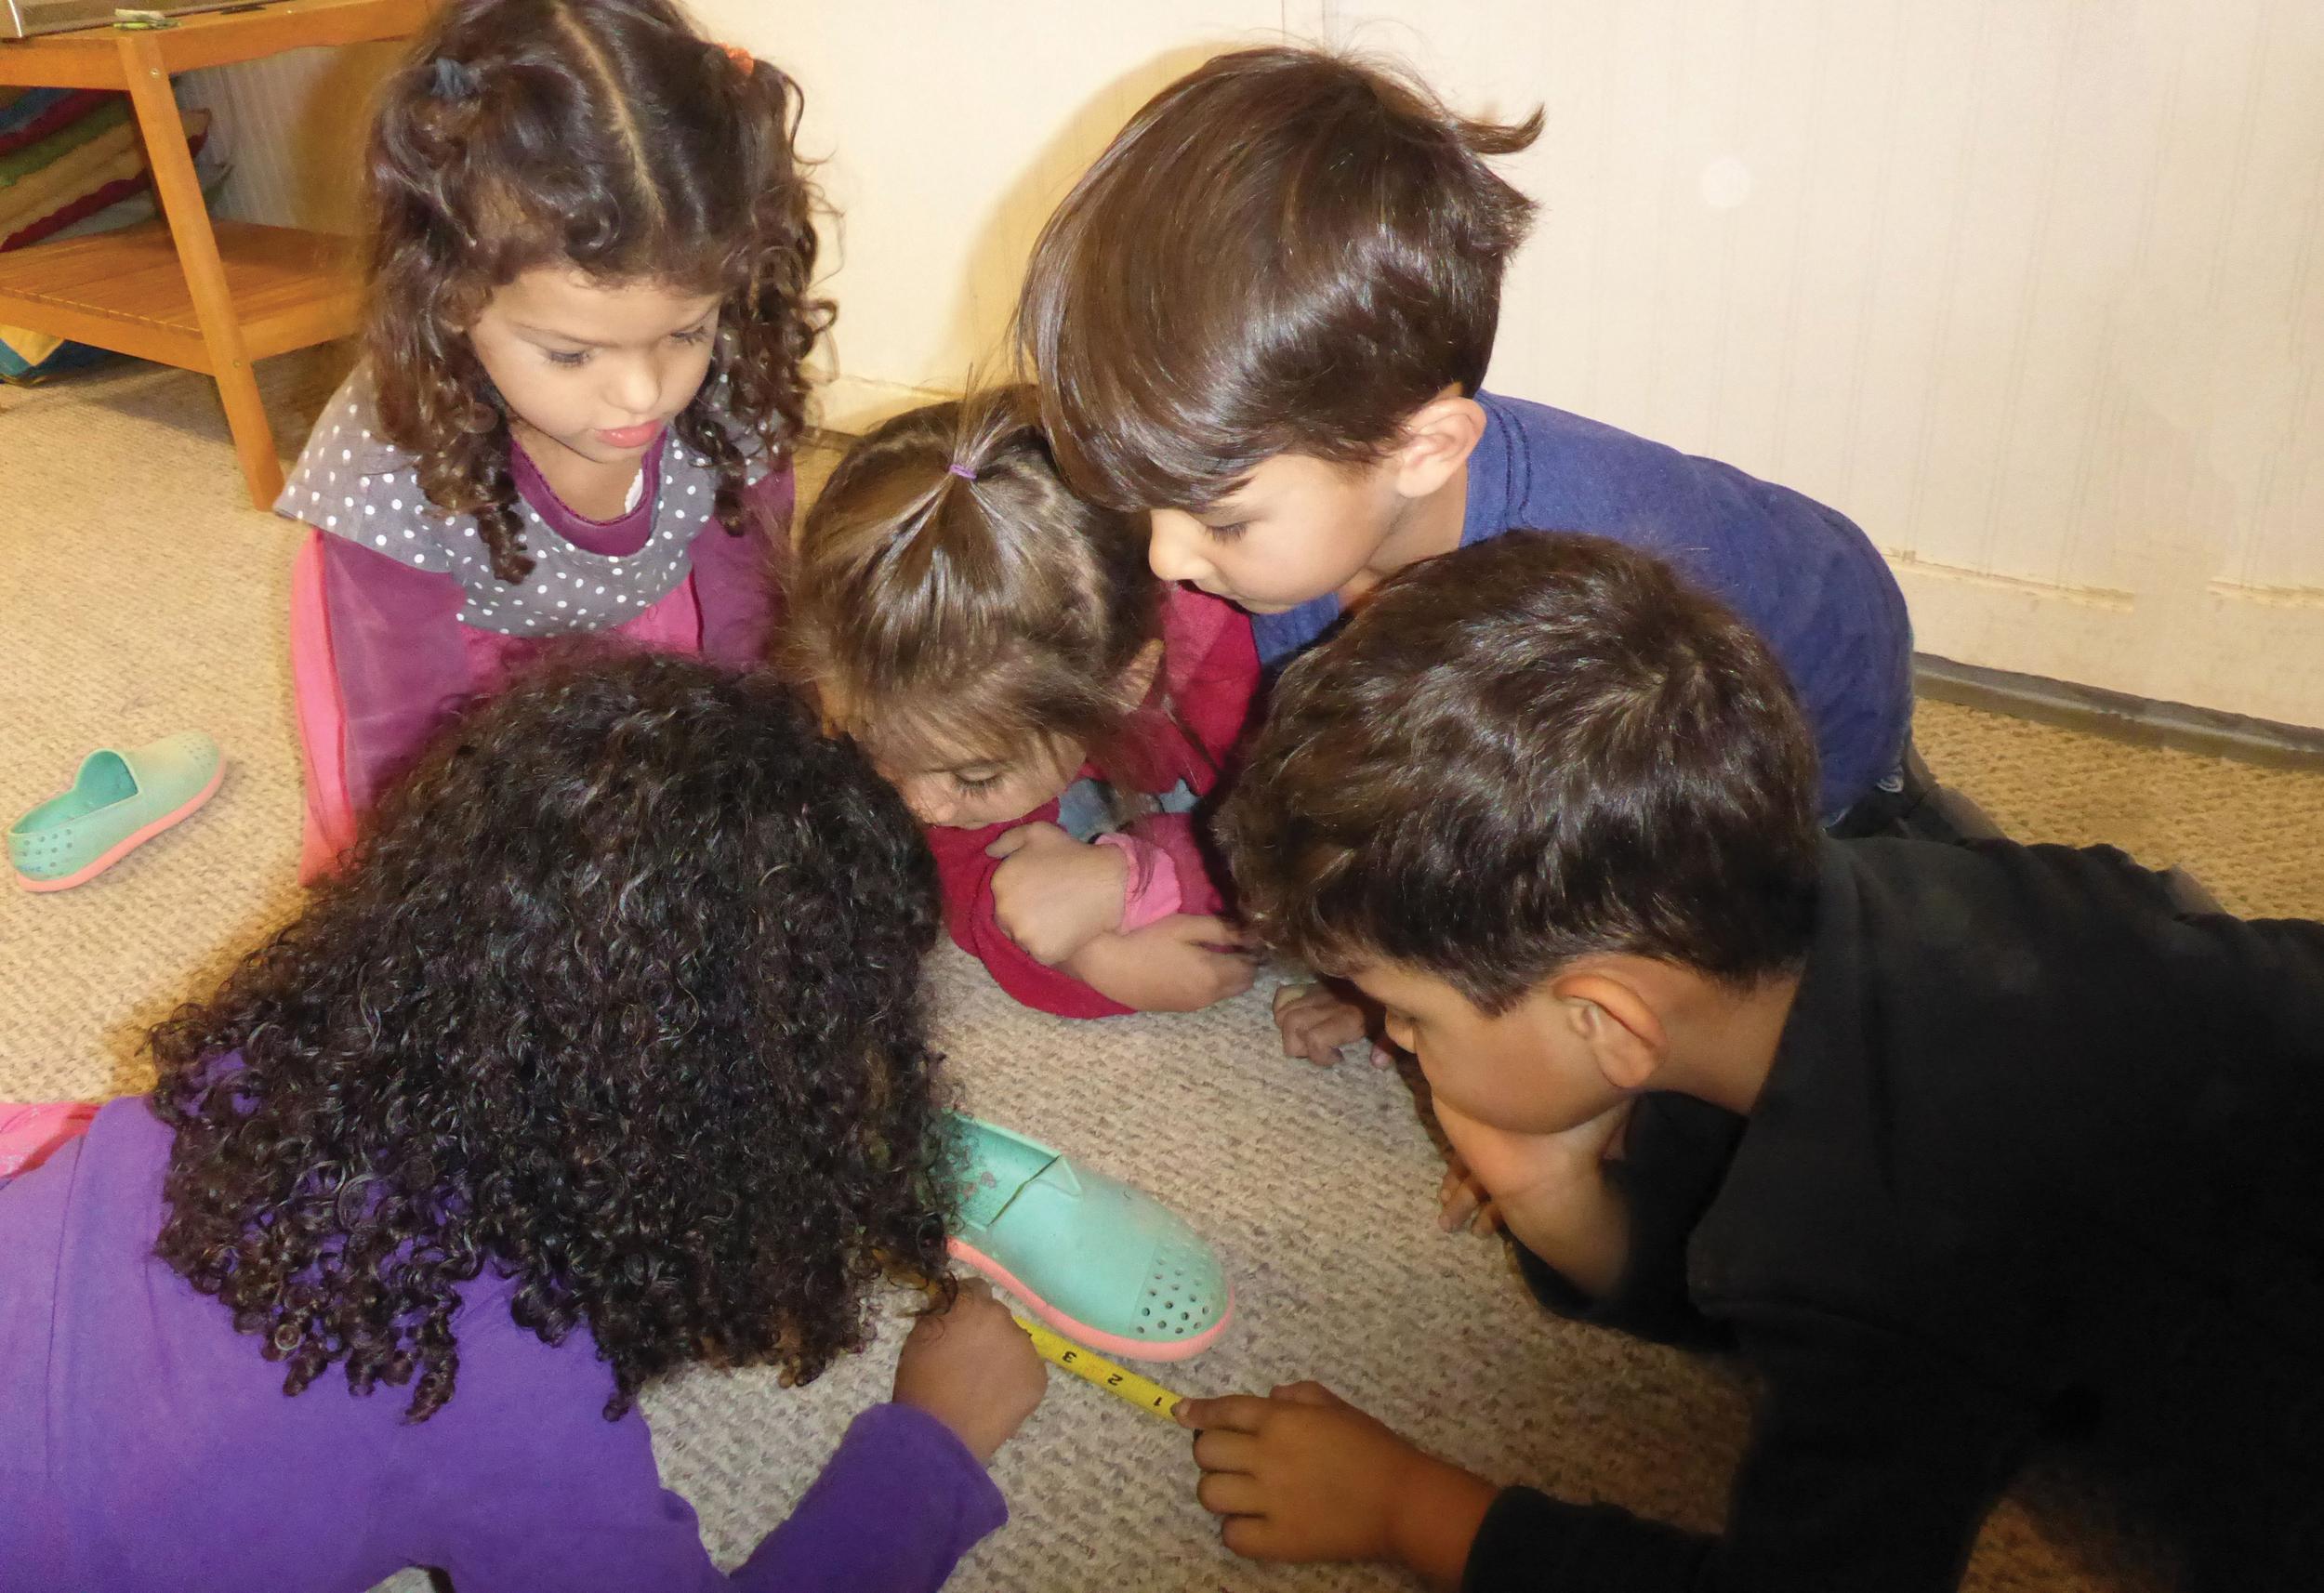 San Francisco, Spanish immersion preschool, bilingual preschool, Spanish preschool, Reggio Emilia preschool, child-centered preschool, parent coop preschool, parent participation preschool